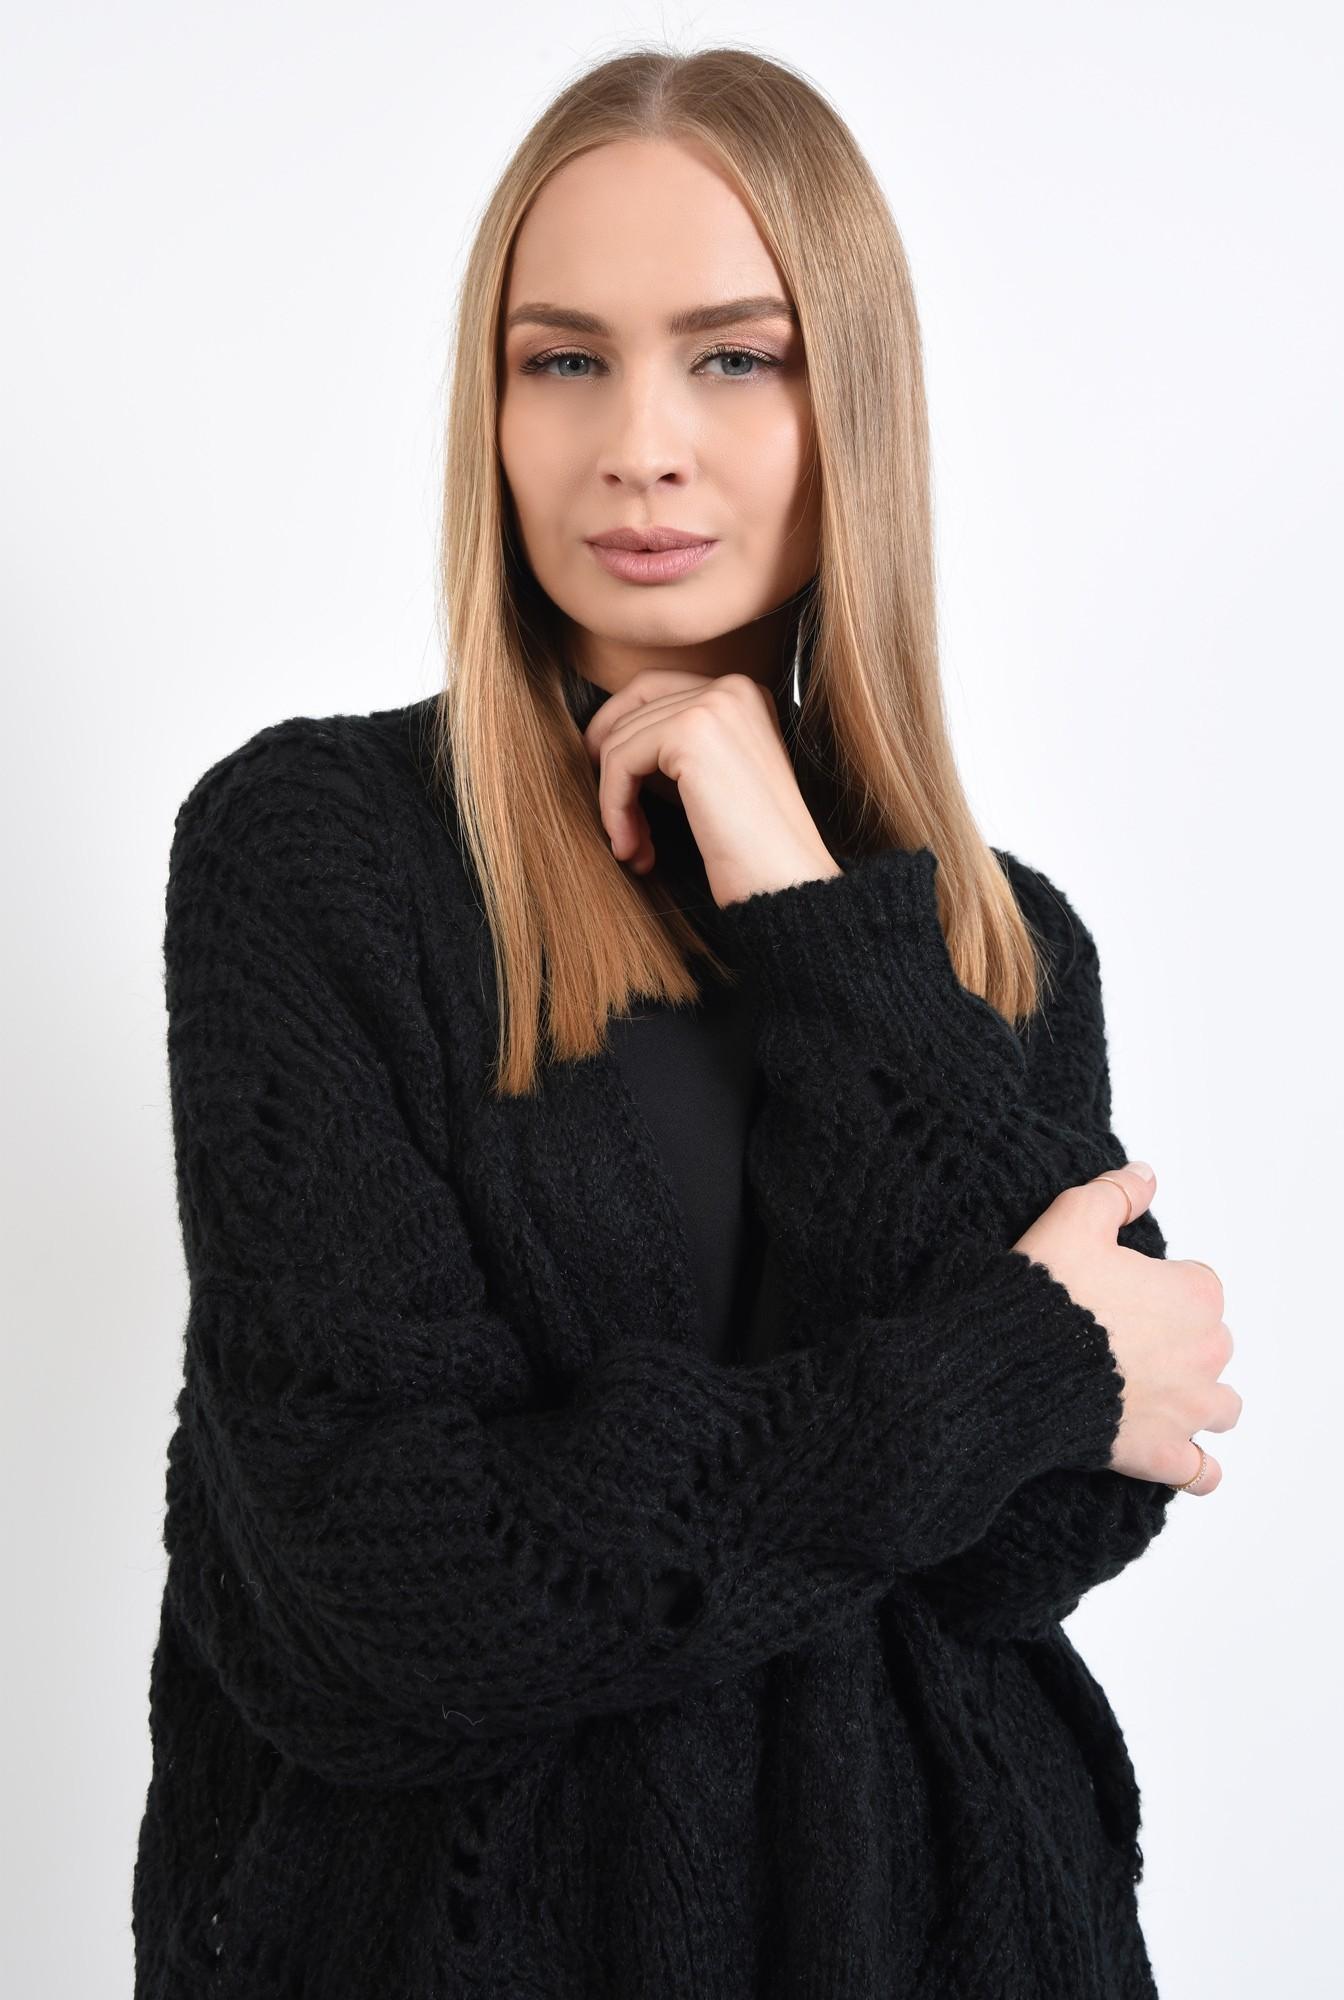 2 - pulover cu gaurele, motive ajurate, maneci bufante, negru